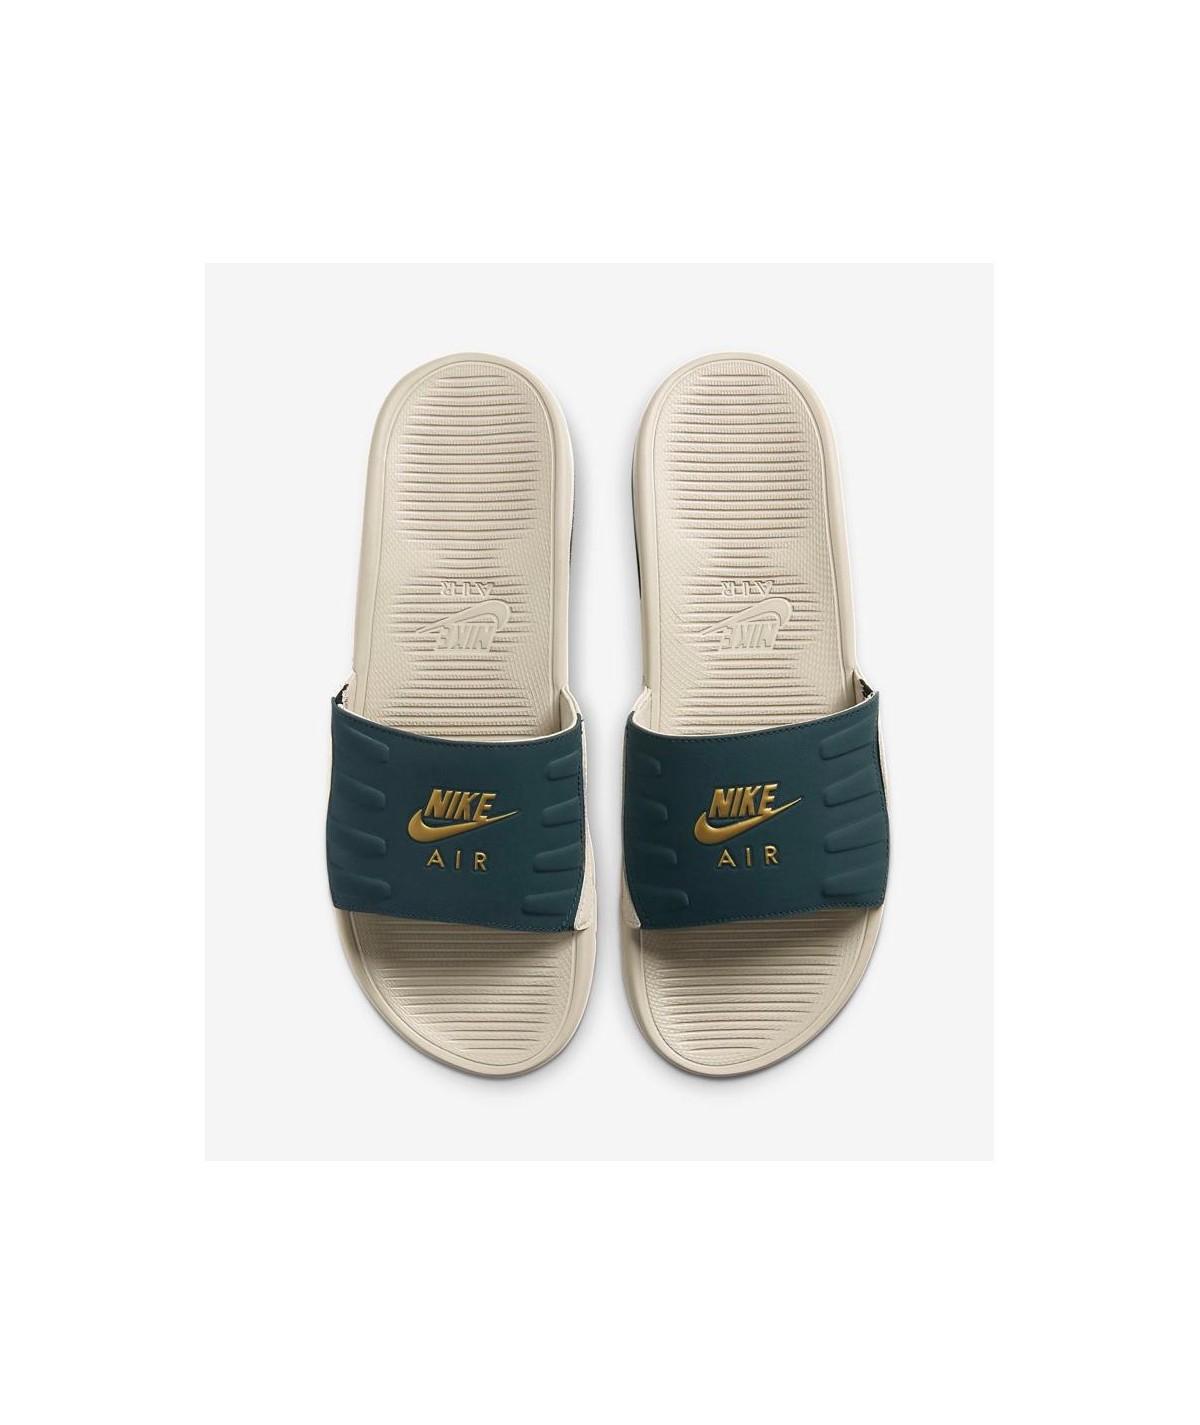 Nike Air Max Sandale I BQ4626-200 i Tongs Homme SlideI Marseille